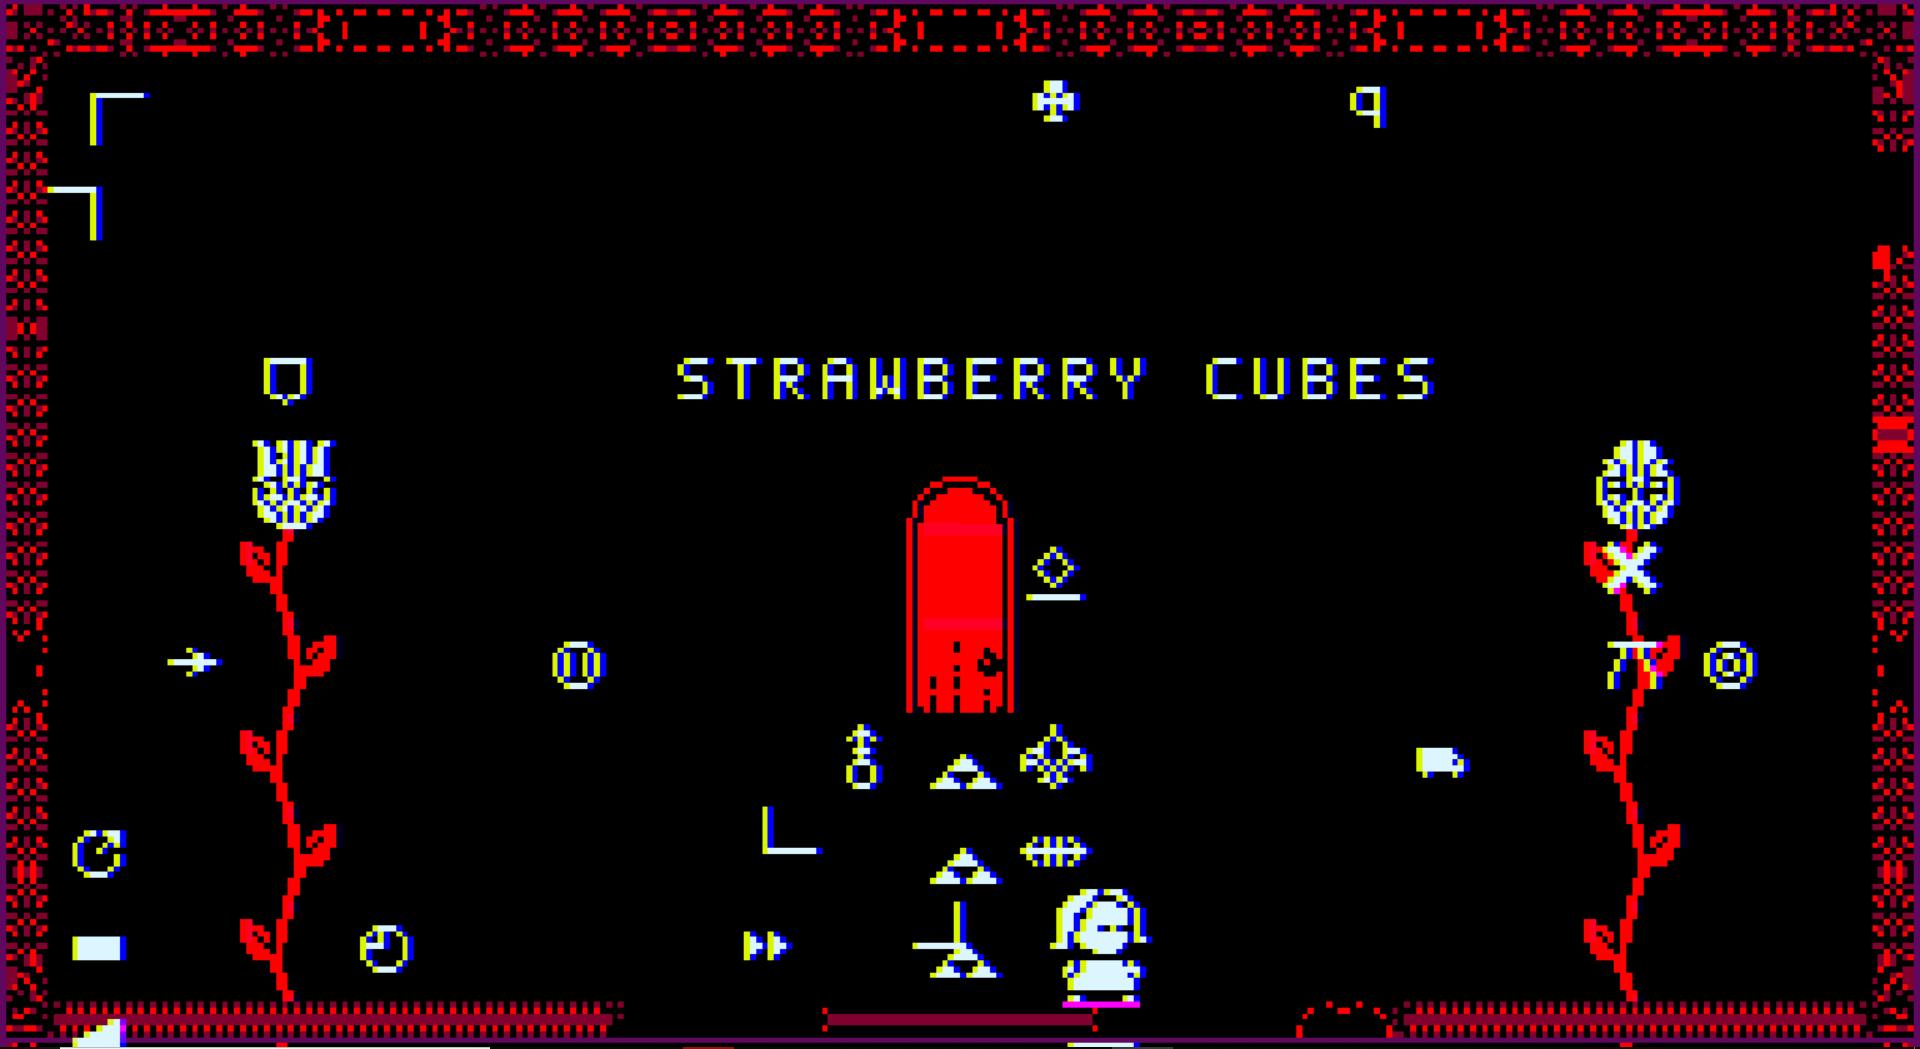 Strawberry cubes Loren Schmidt